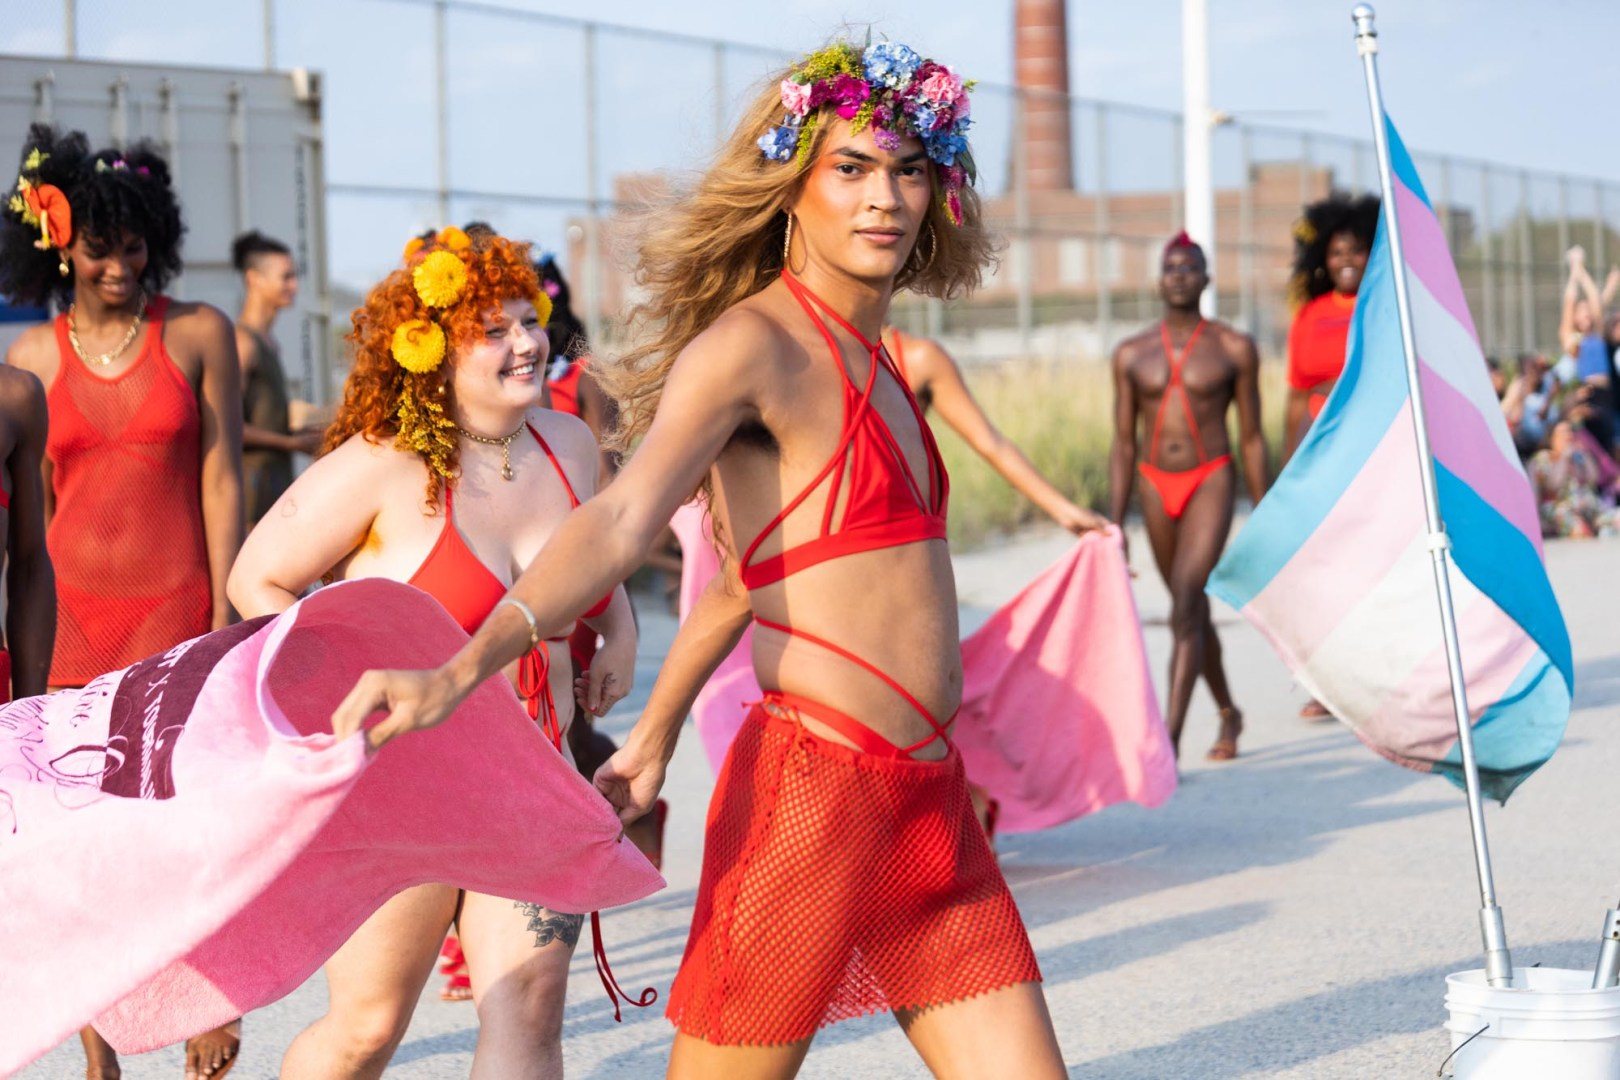 Chromat designer Becca McCharen-Tran is changin the fashion landscape